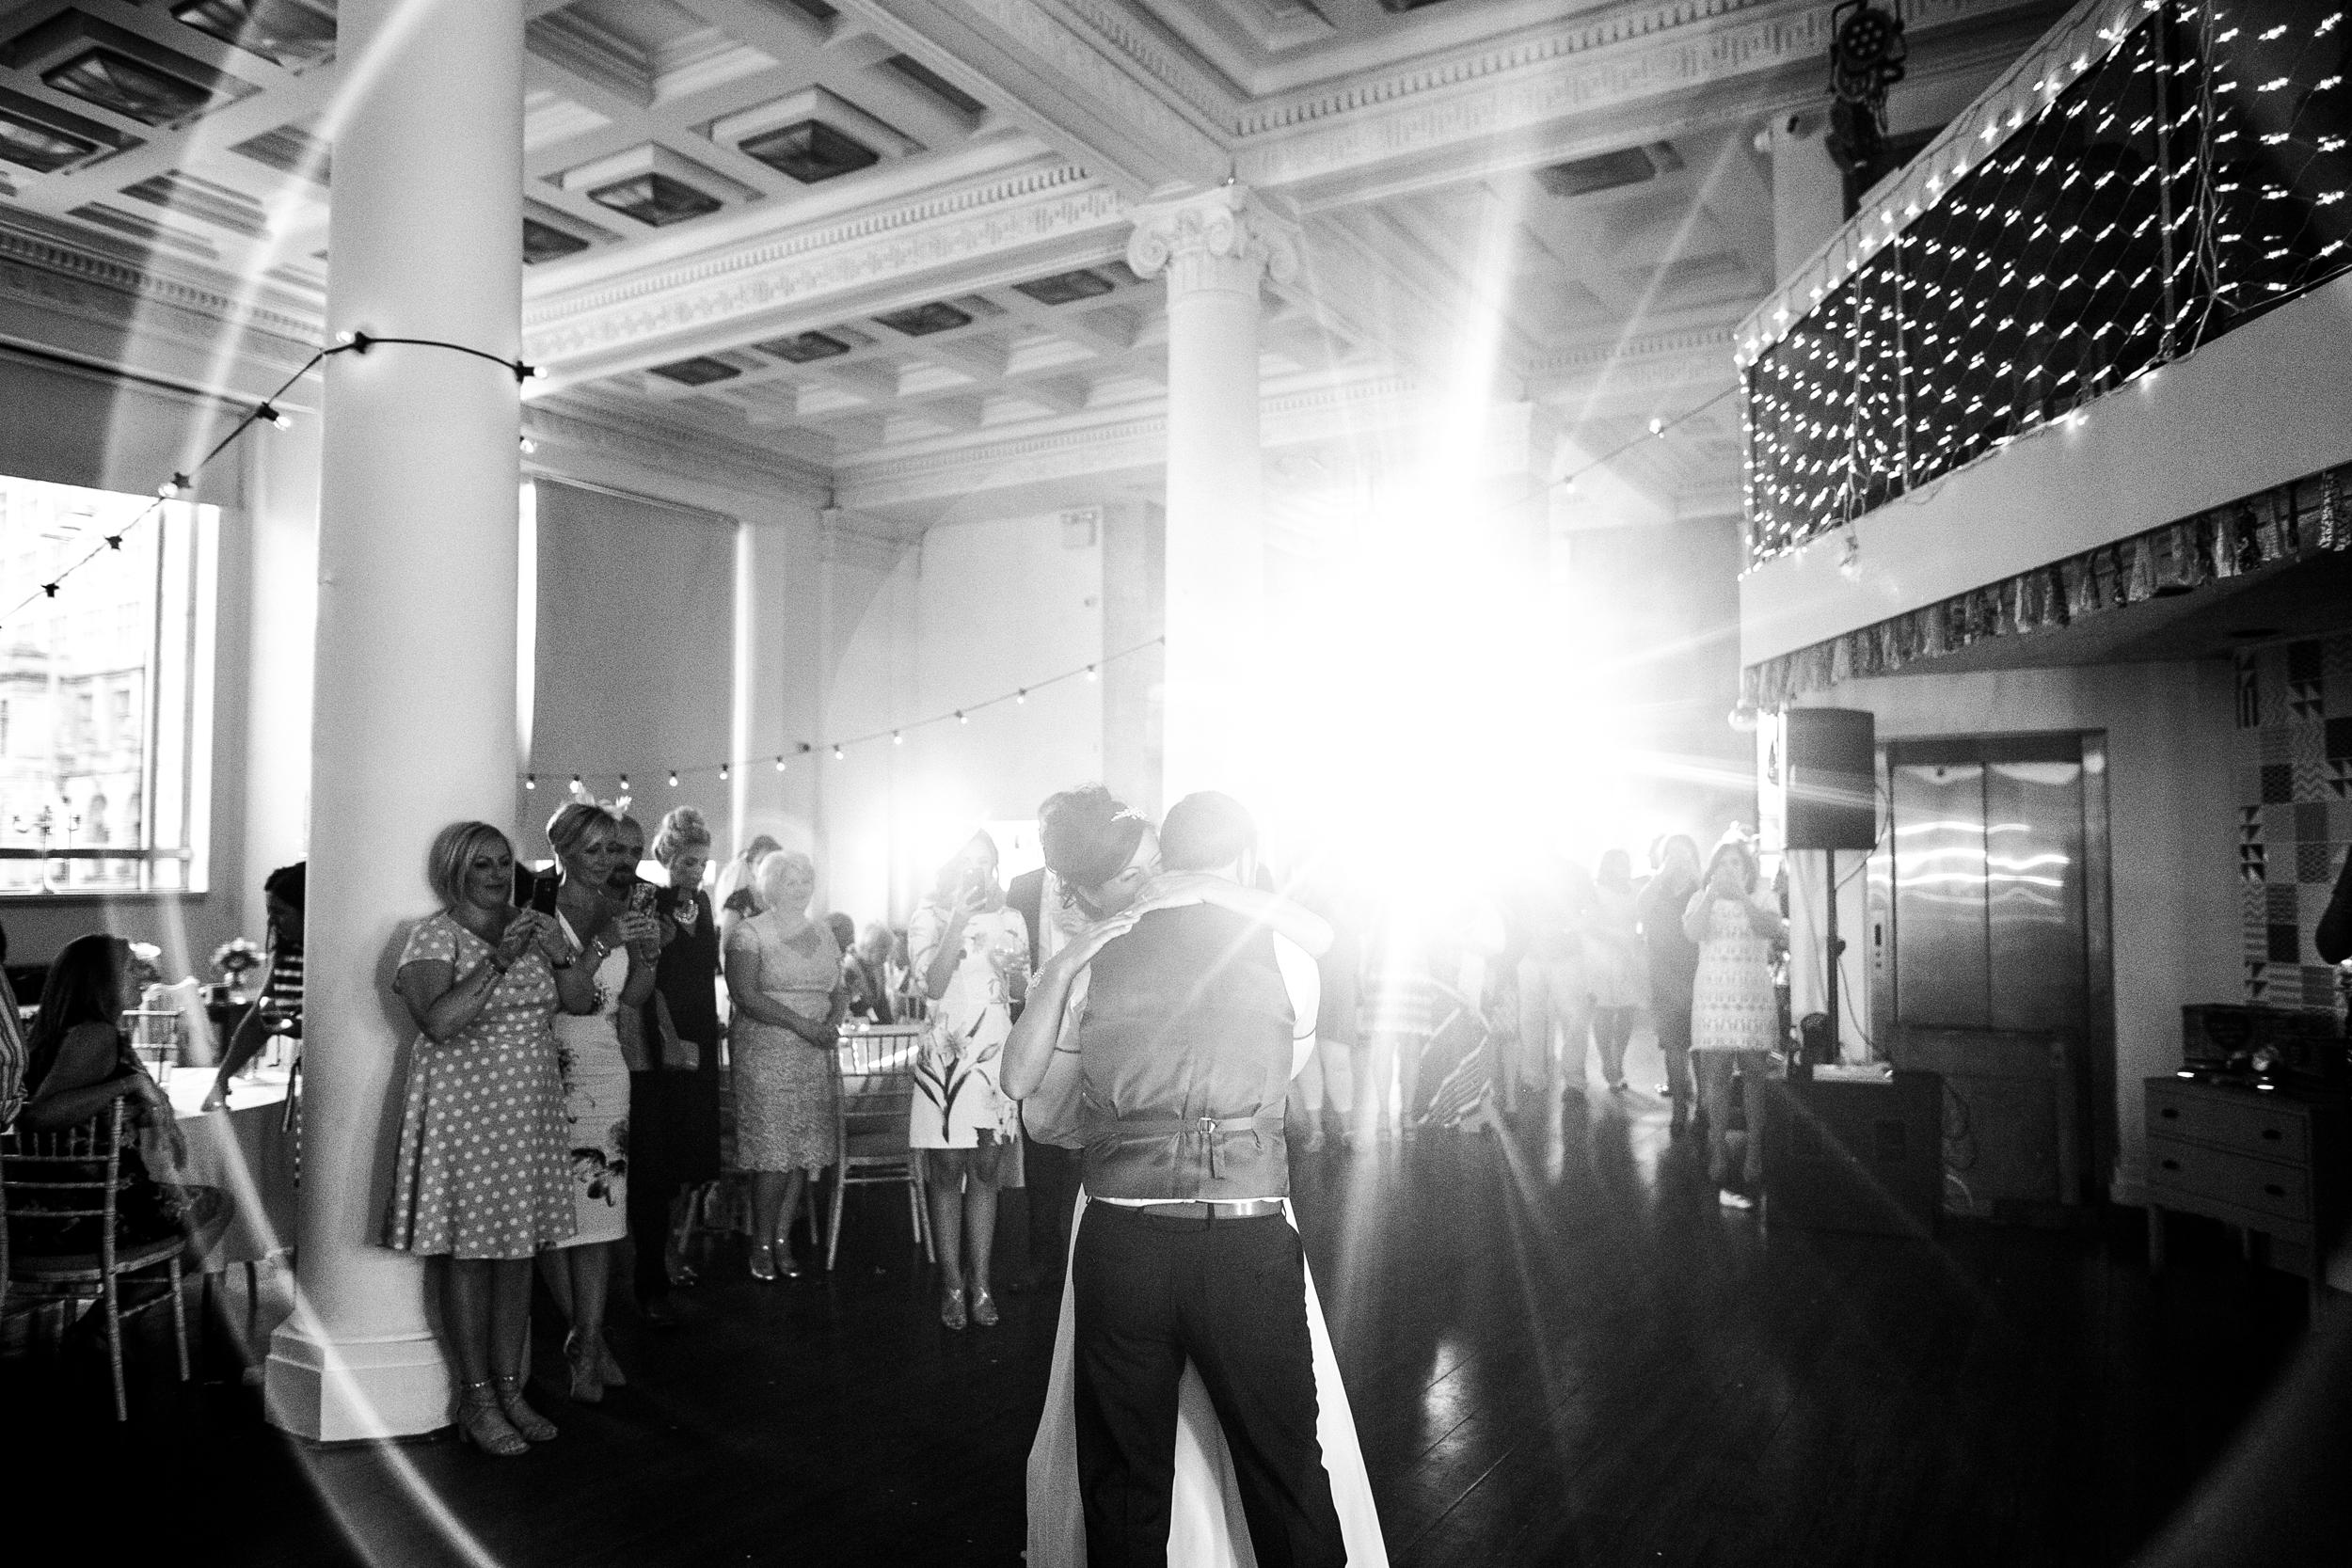 creative-wedding-photography-teesside-north-east-yorkshire-115.jpg